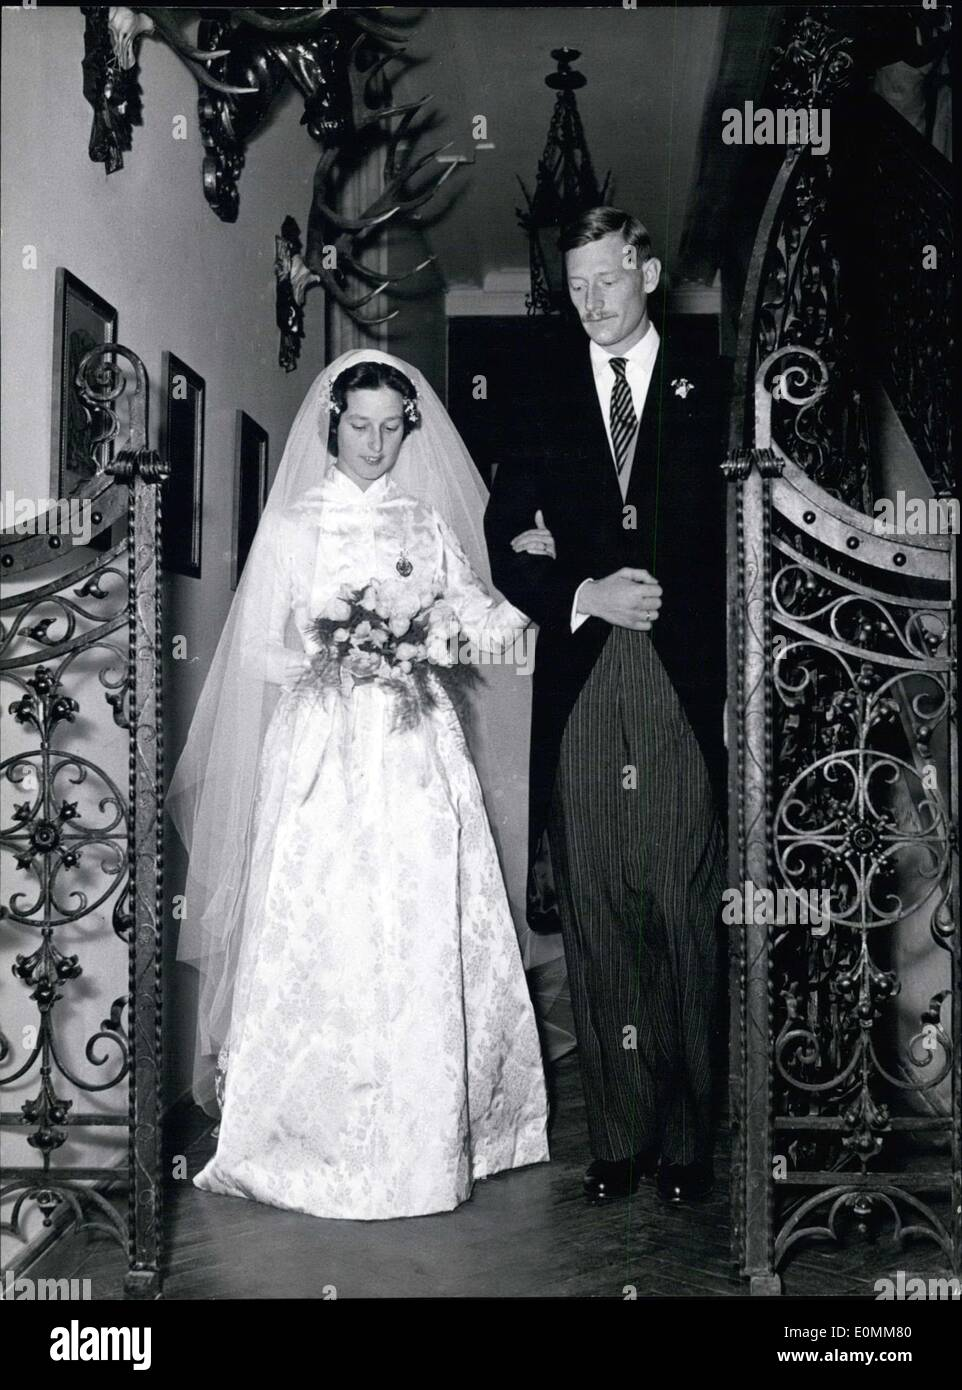 Franz joseph haydn pictures of wedding